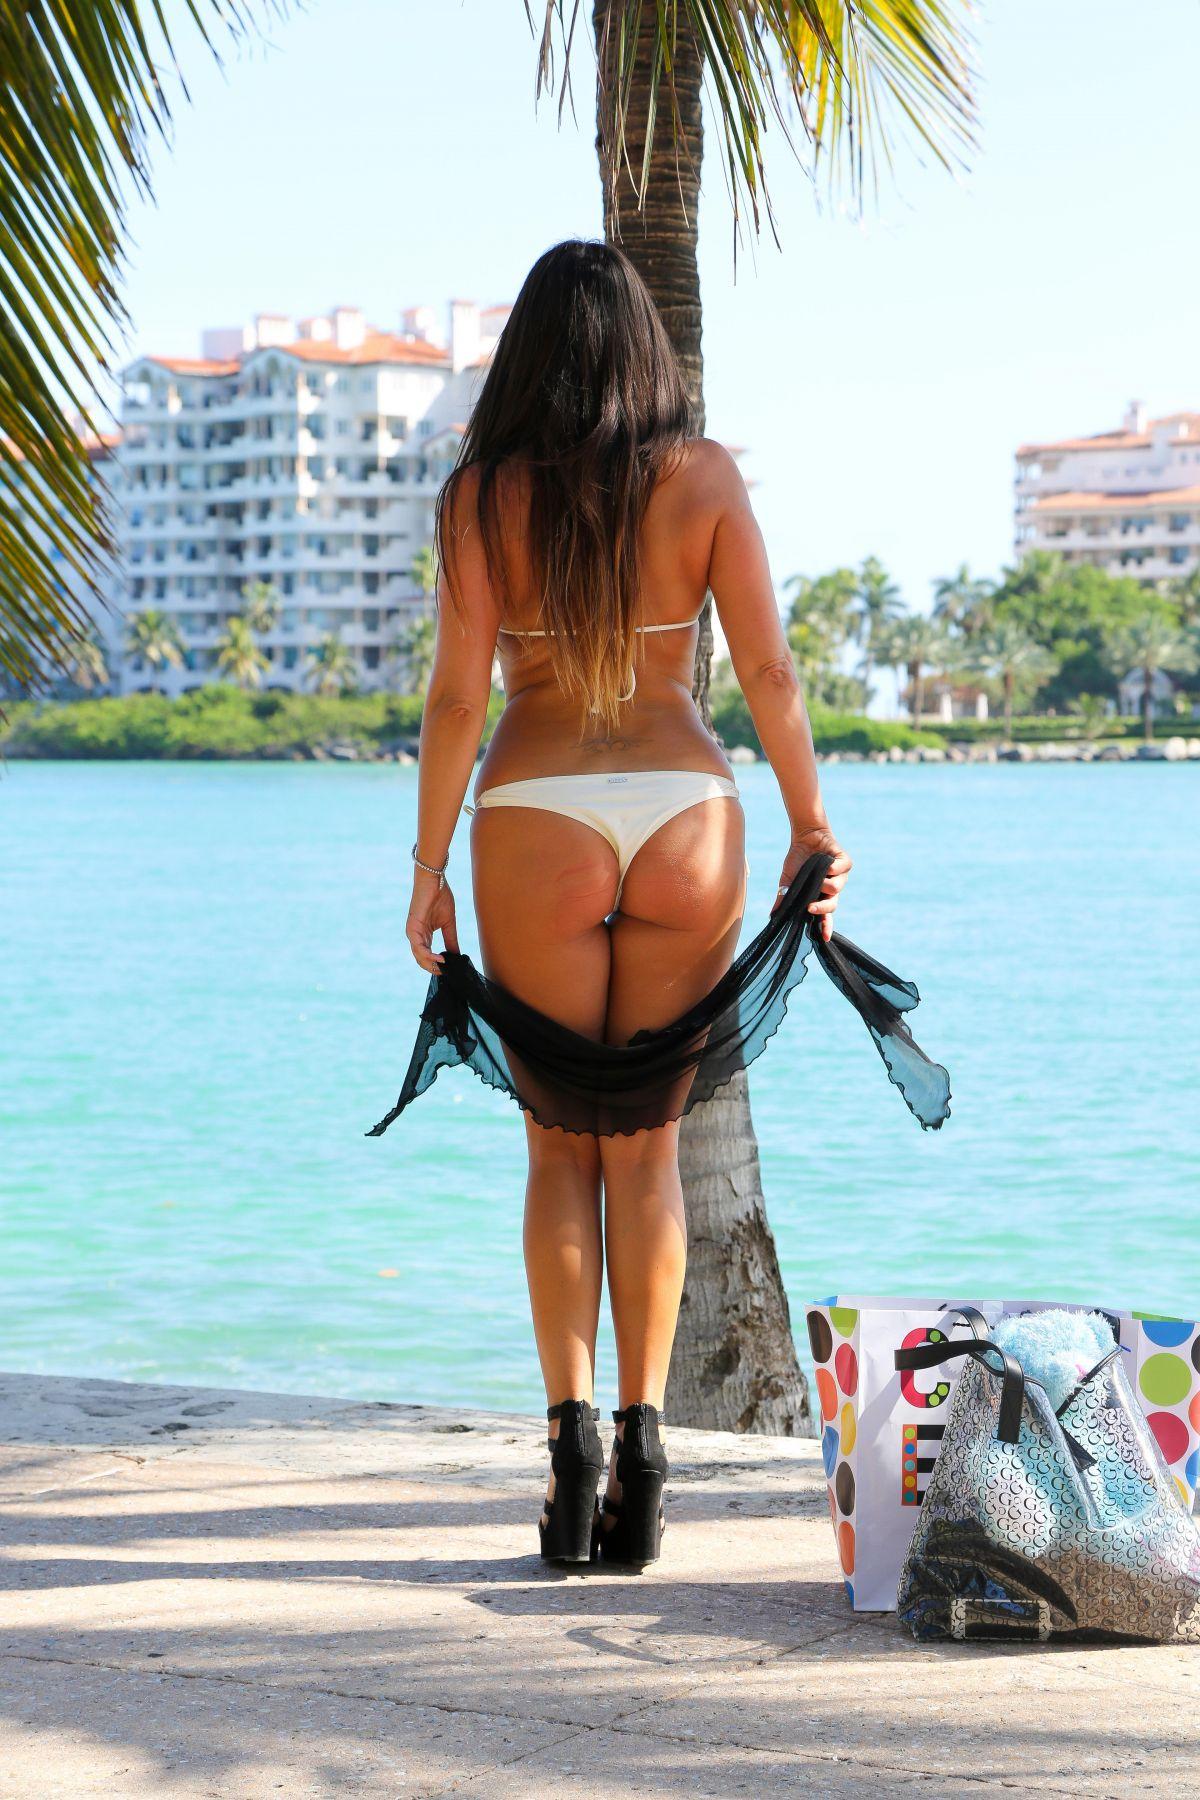 Erotica Claudia Romani nudes (41 photo), Topless, Leaked, Twitter, braless 2020